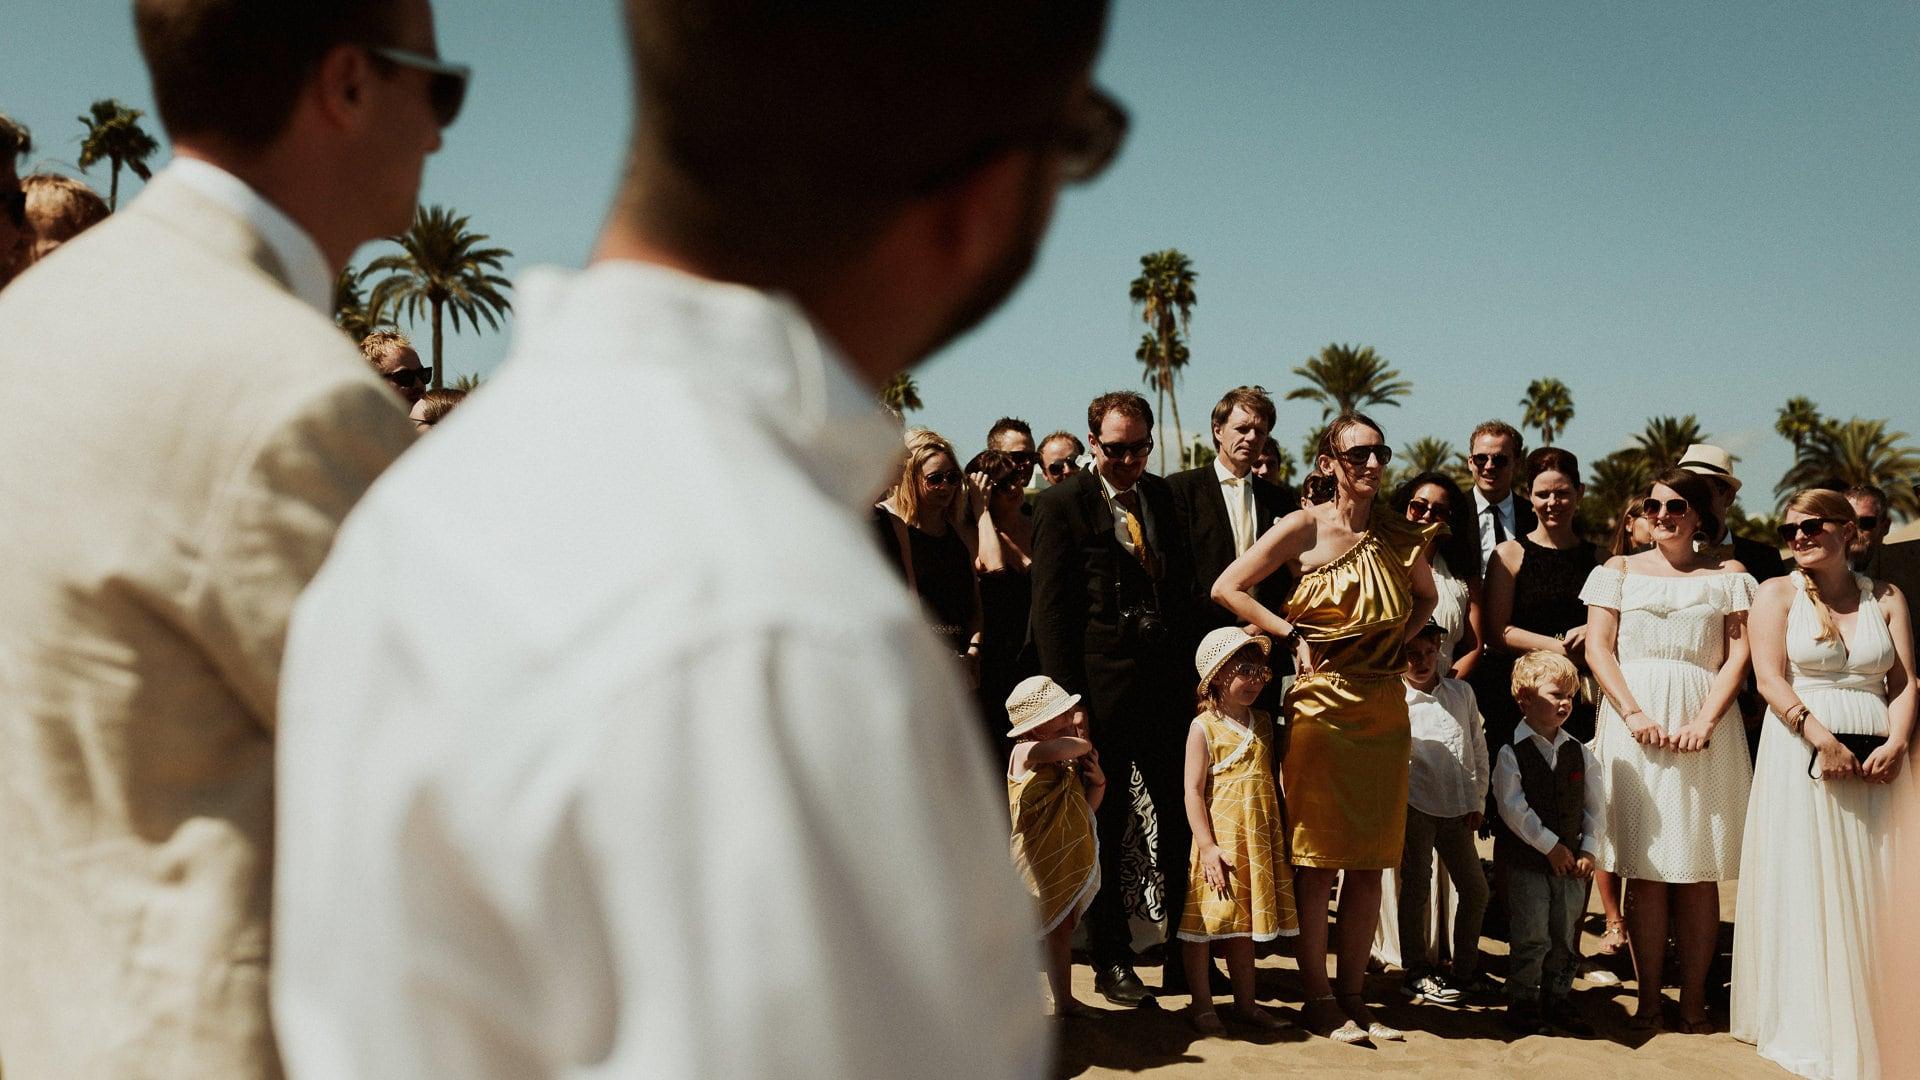 Grancanaria Samesex Lgbtq Wedding Photographer Spain 0026